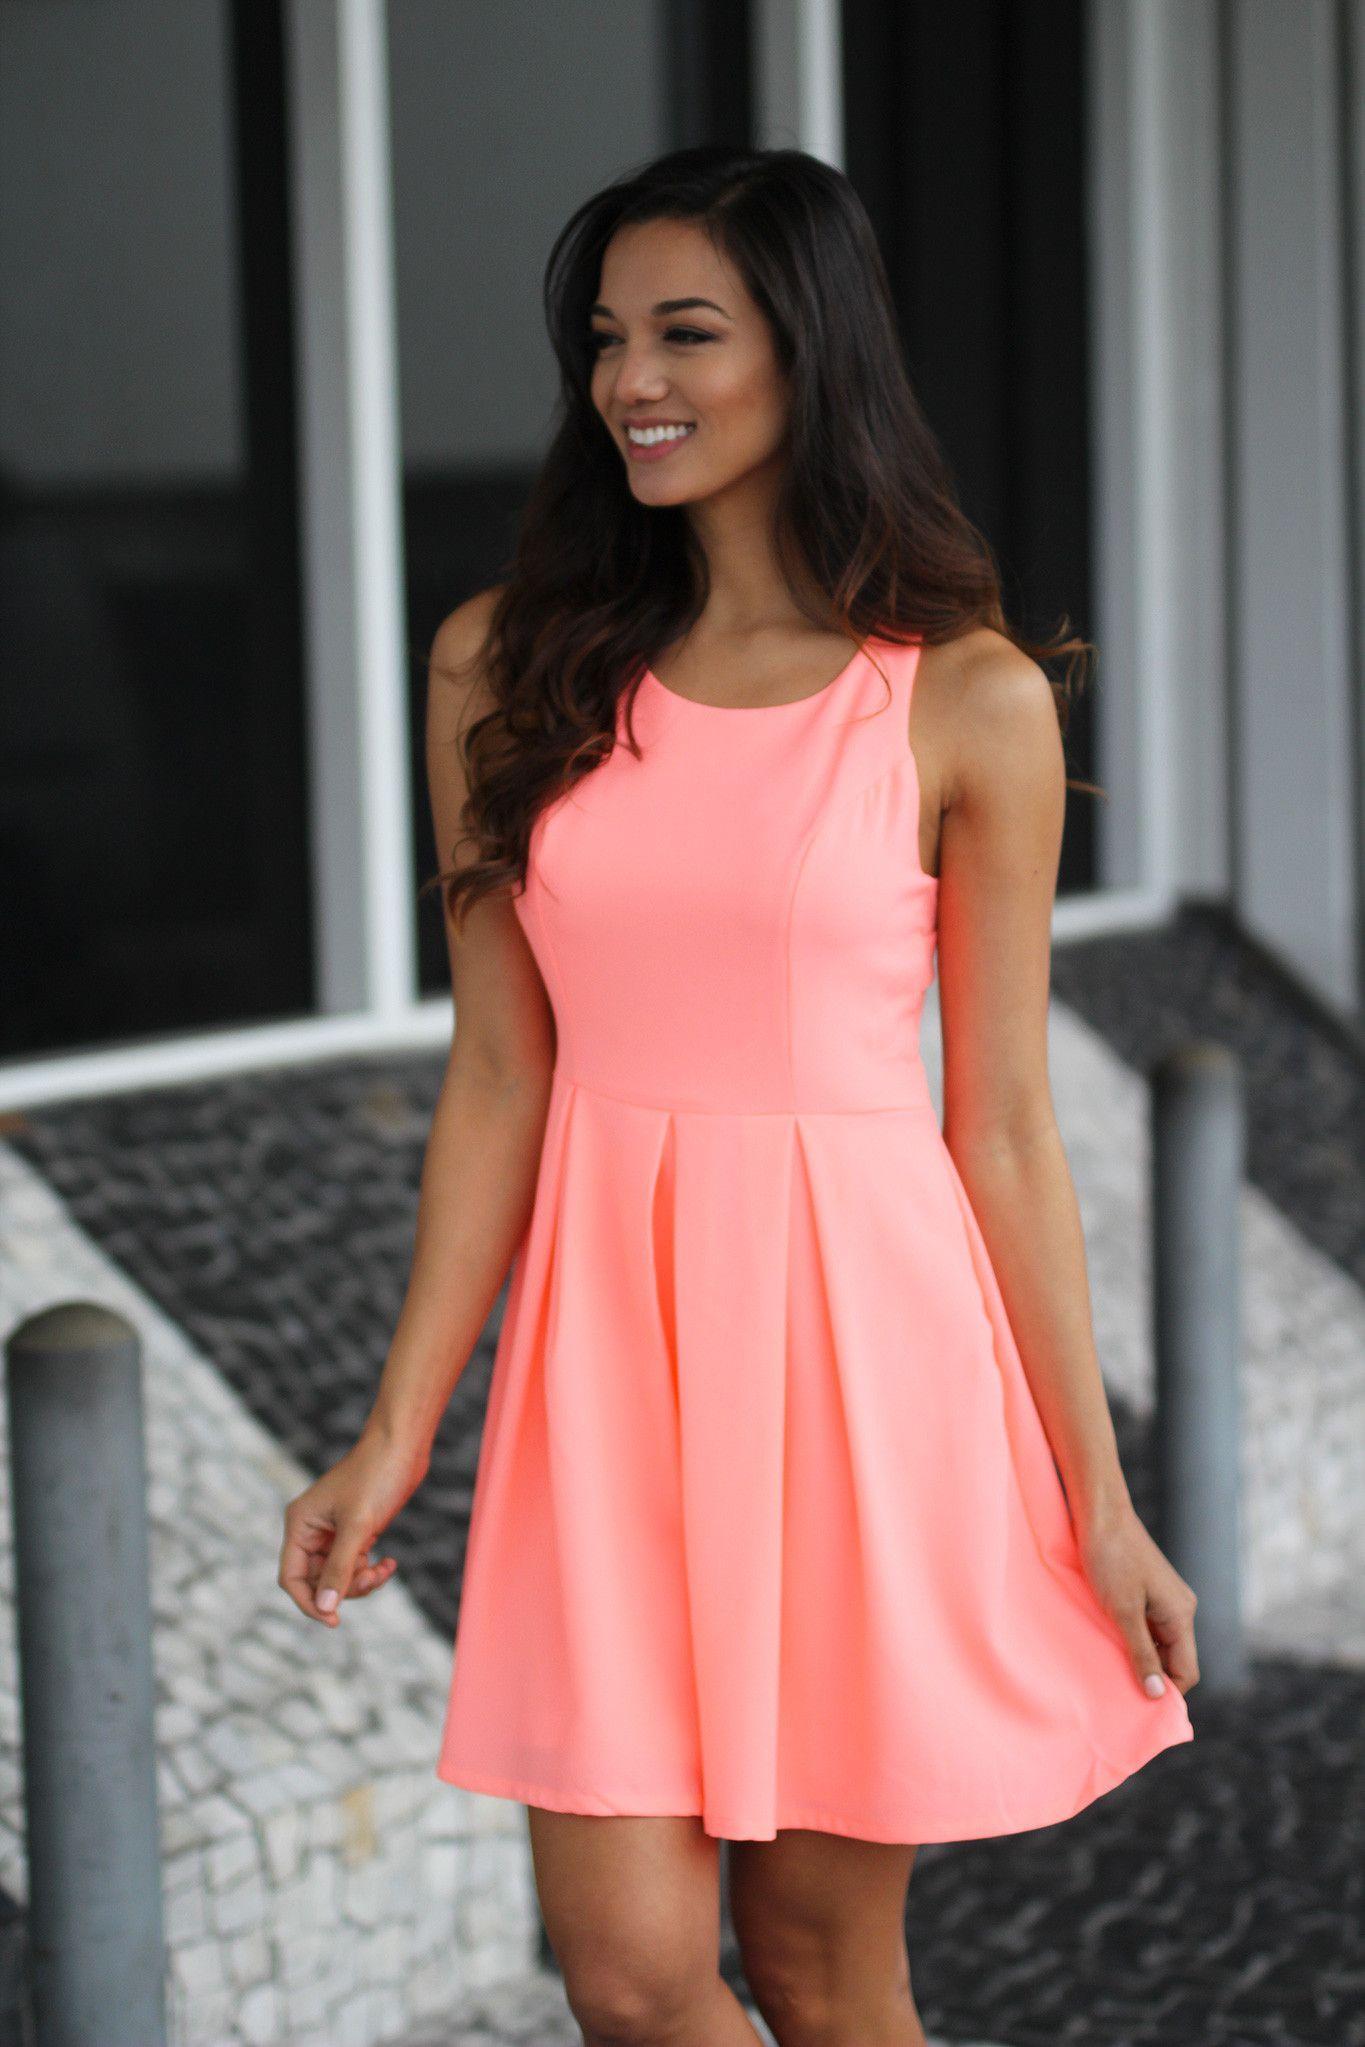 Neon Peach Short Dress with Open Back | Pinterest